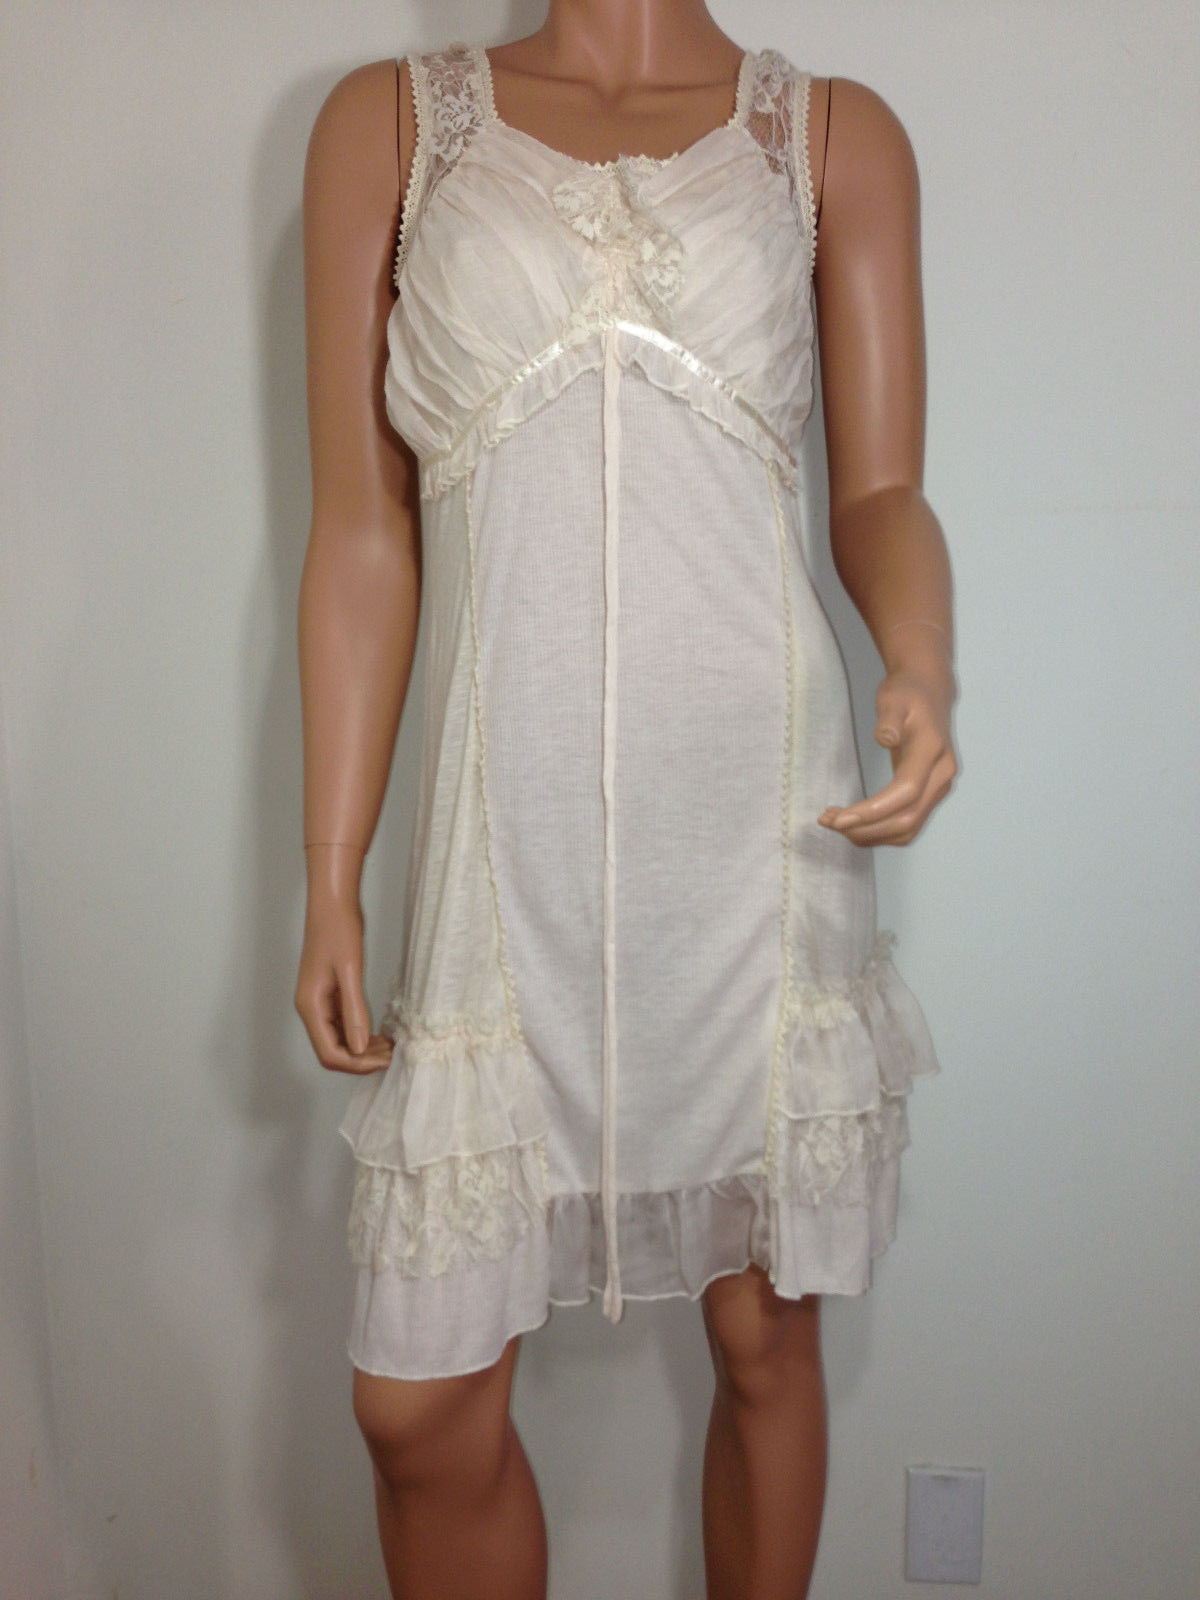 Forla Paris ivory Cream Sheer Lace Romantic Boho Chic ruffle Dress SMALL